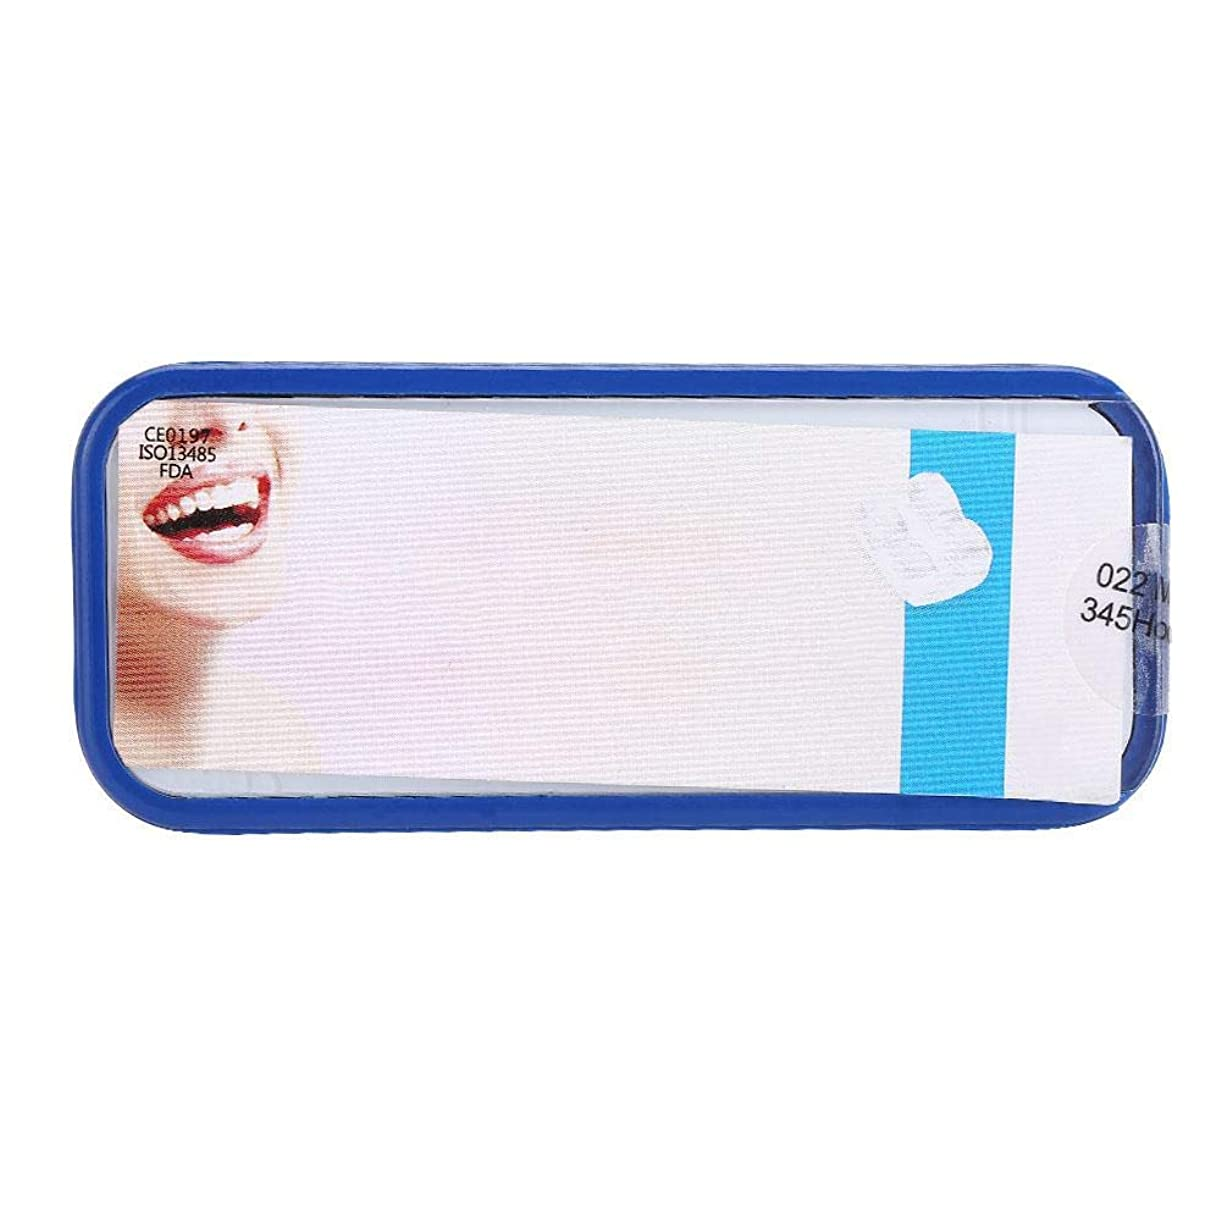 宿泊商品刺すNitrip セラミックブラケット 歯科矯正ブラケット 歯科矯正装置 歯科矯正用 022MBT 345Hooks